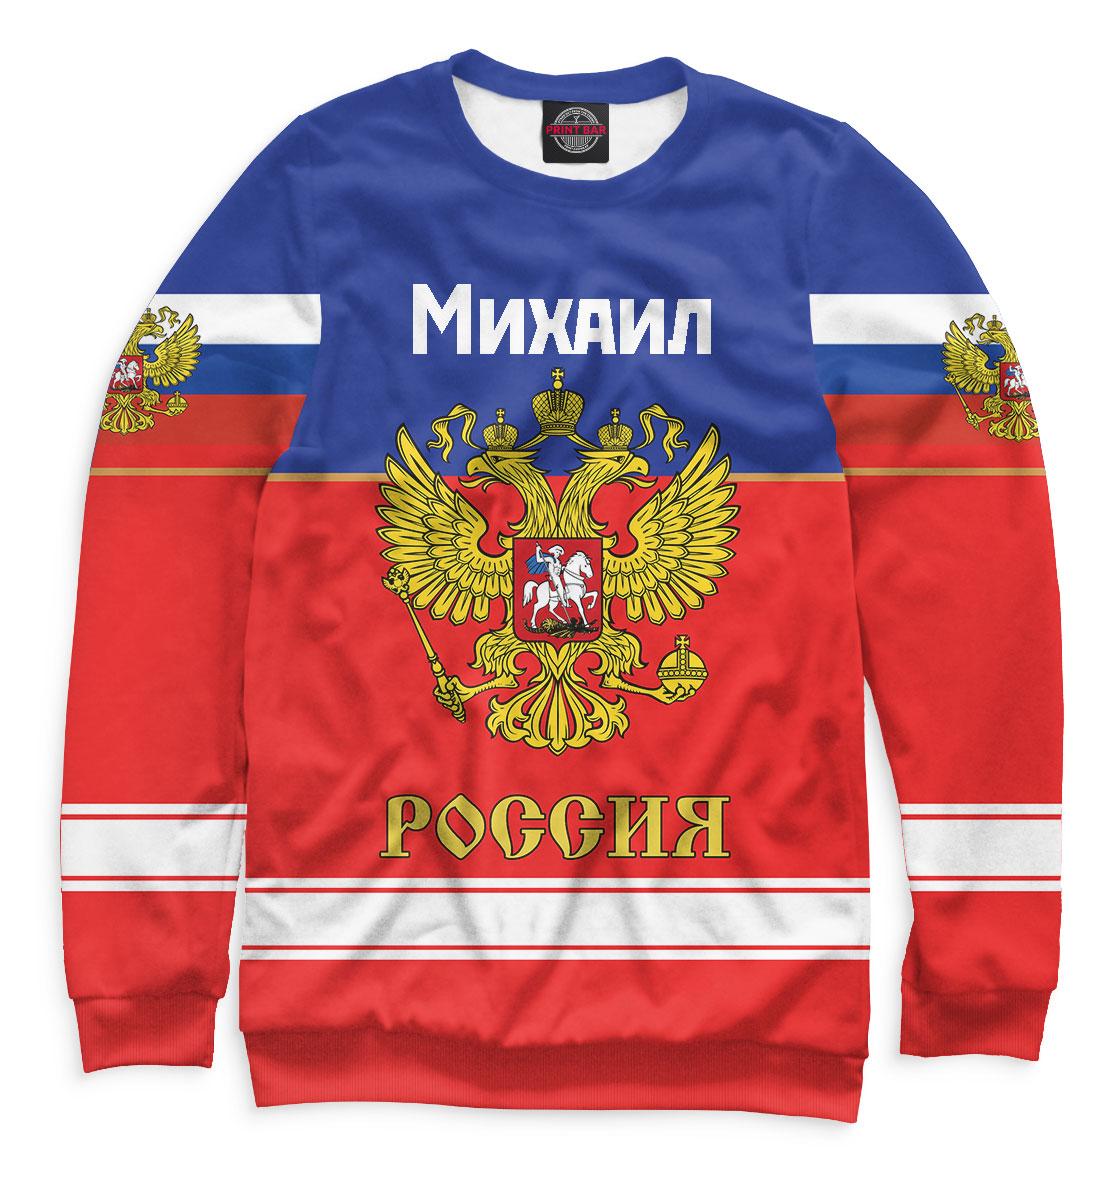 Купить Хоккеист Михаил, Printbar, Свитшоты, MCH-485408-swi